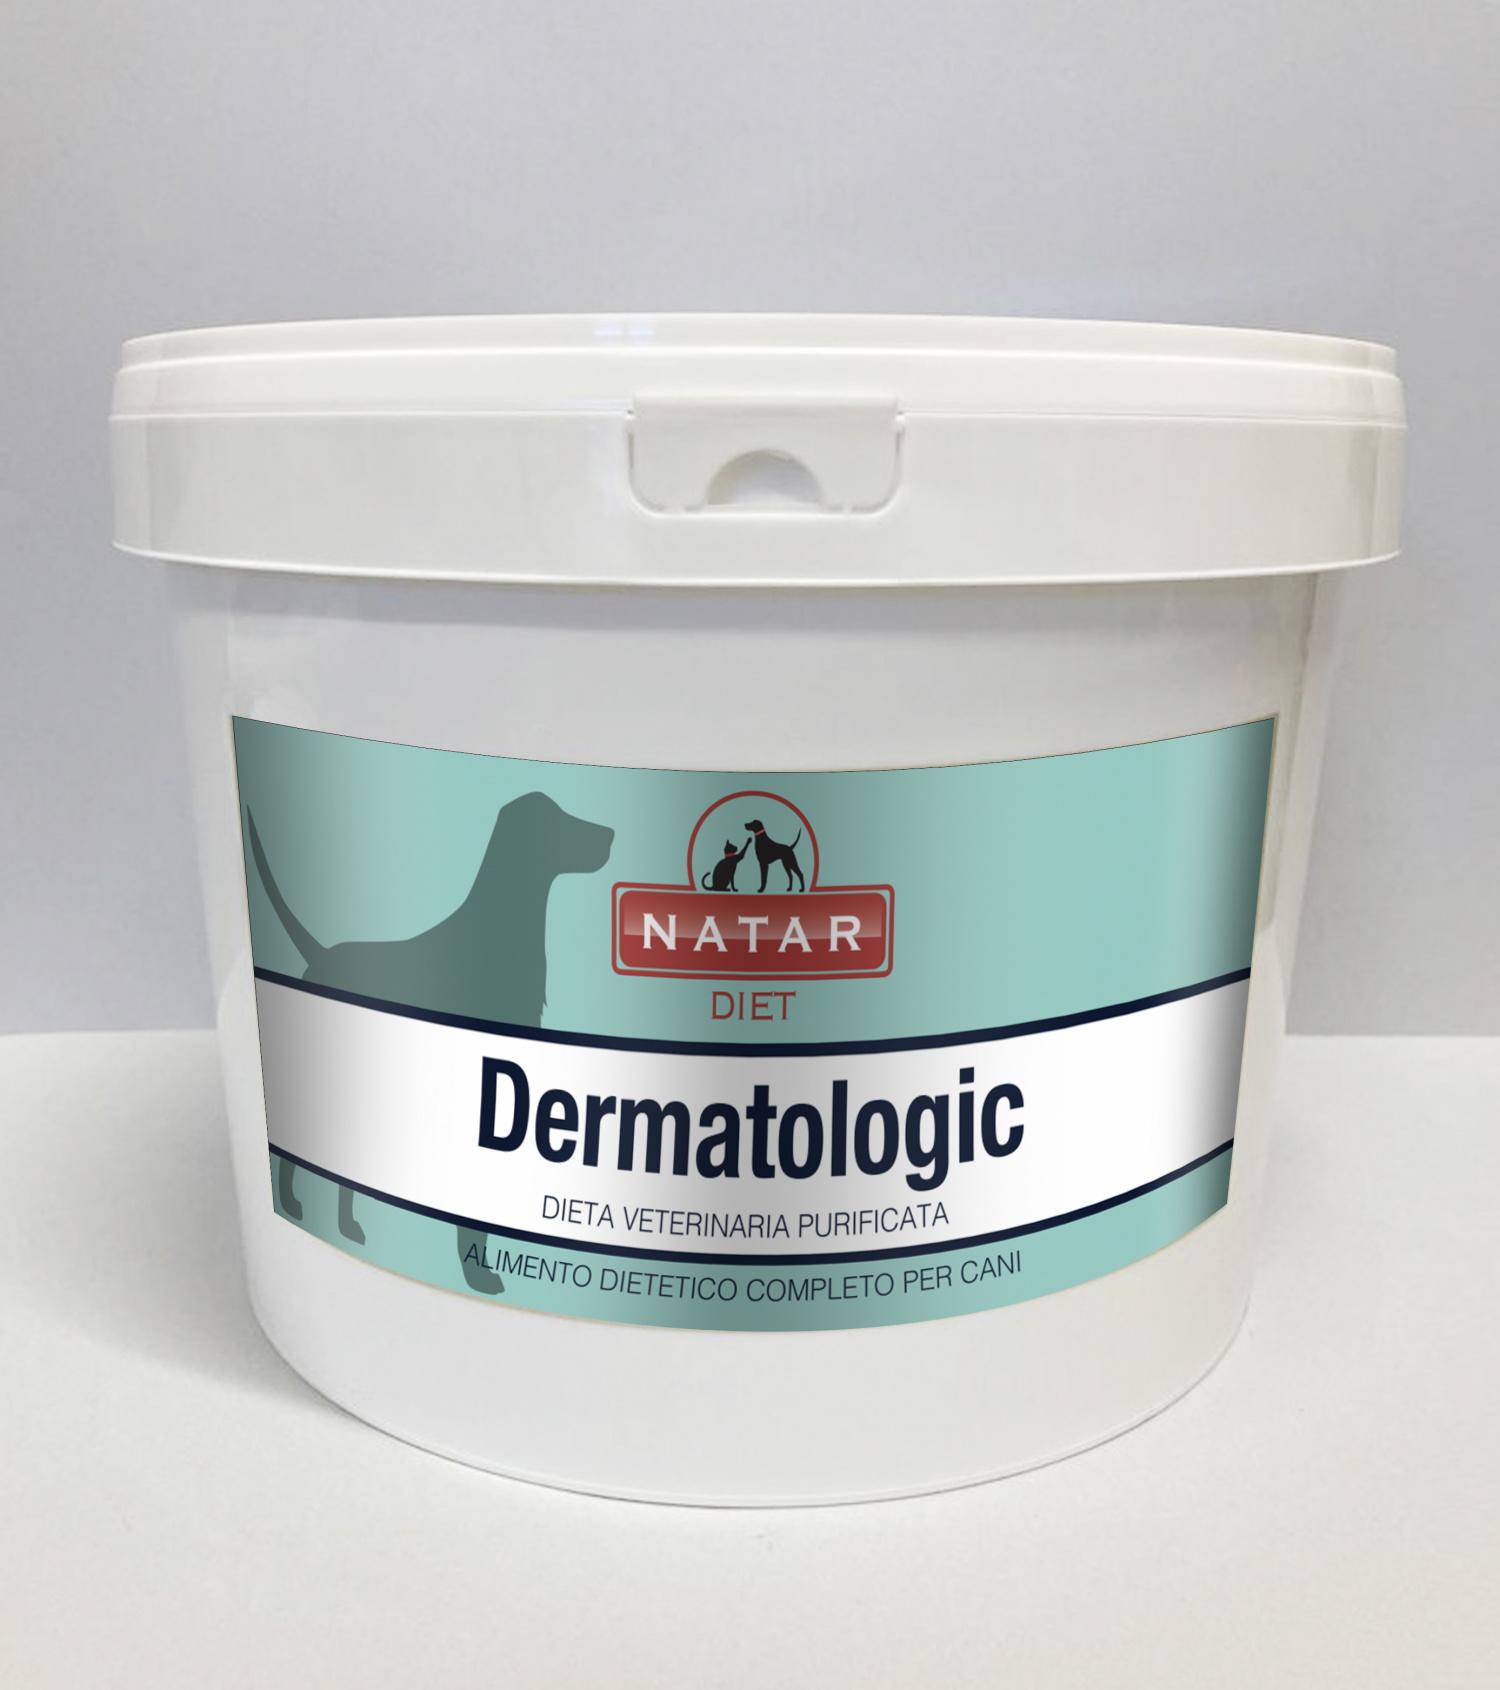 Natar Diet Dermatologic for dogs